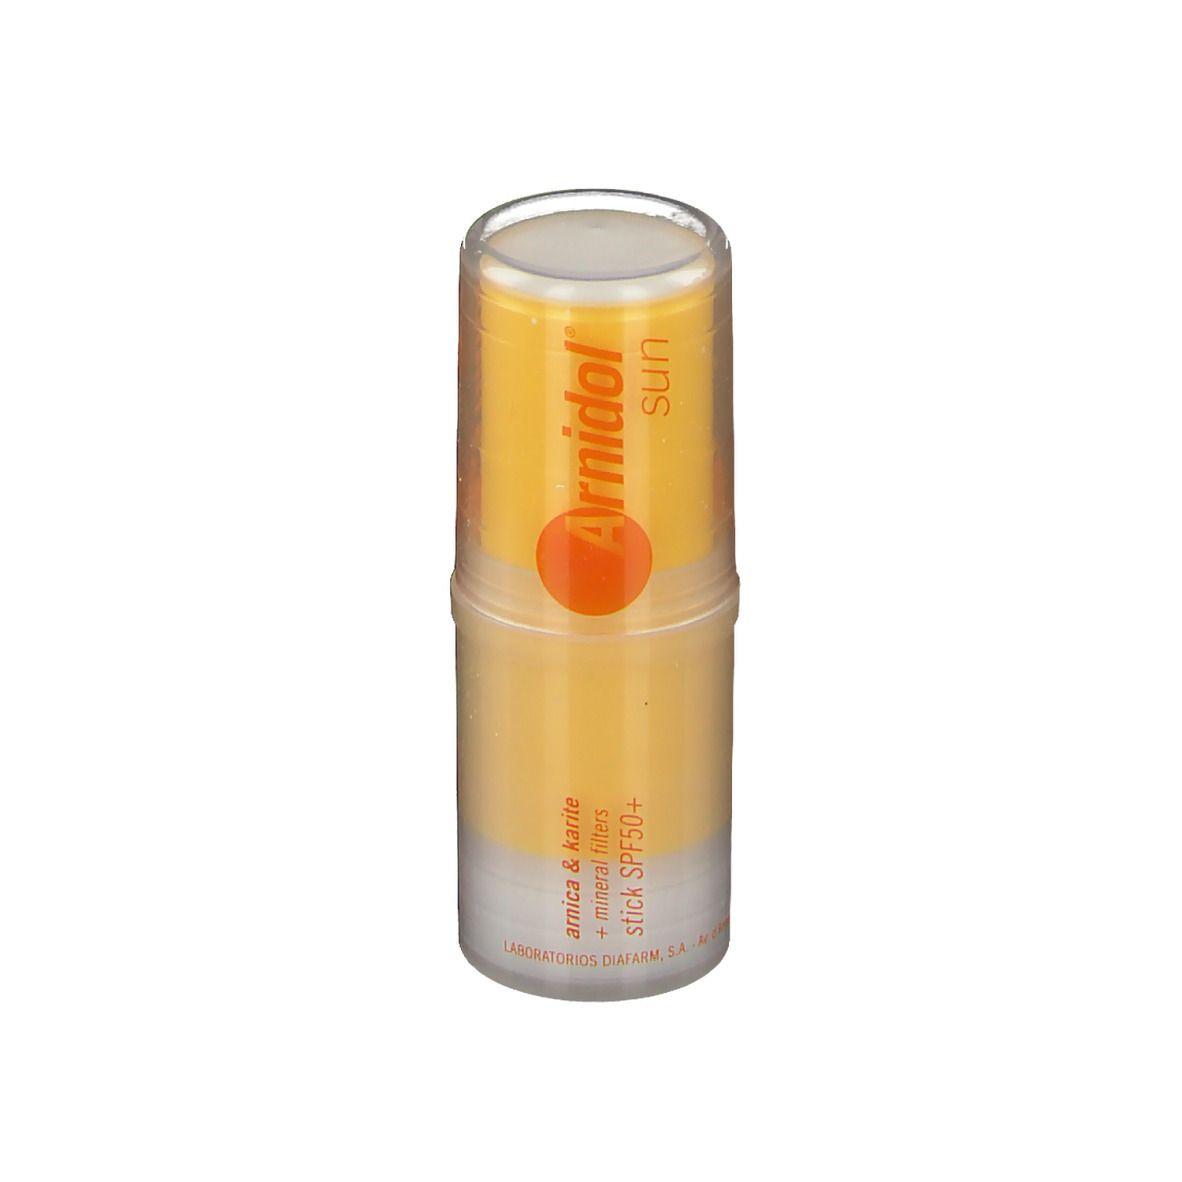 Image of Arnidol Sun Stick LSF 50+